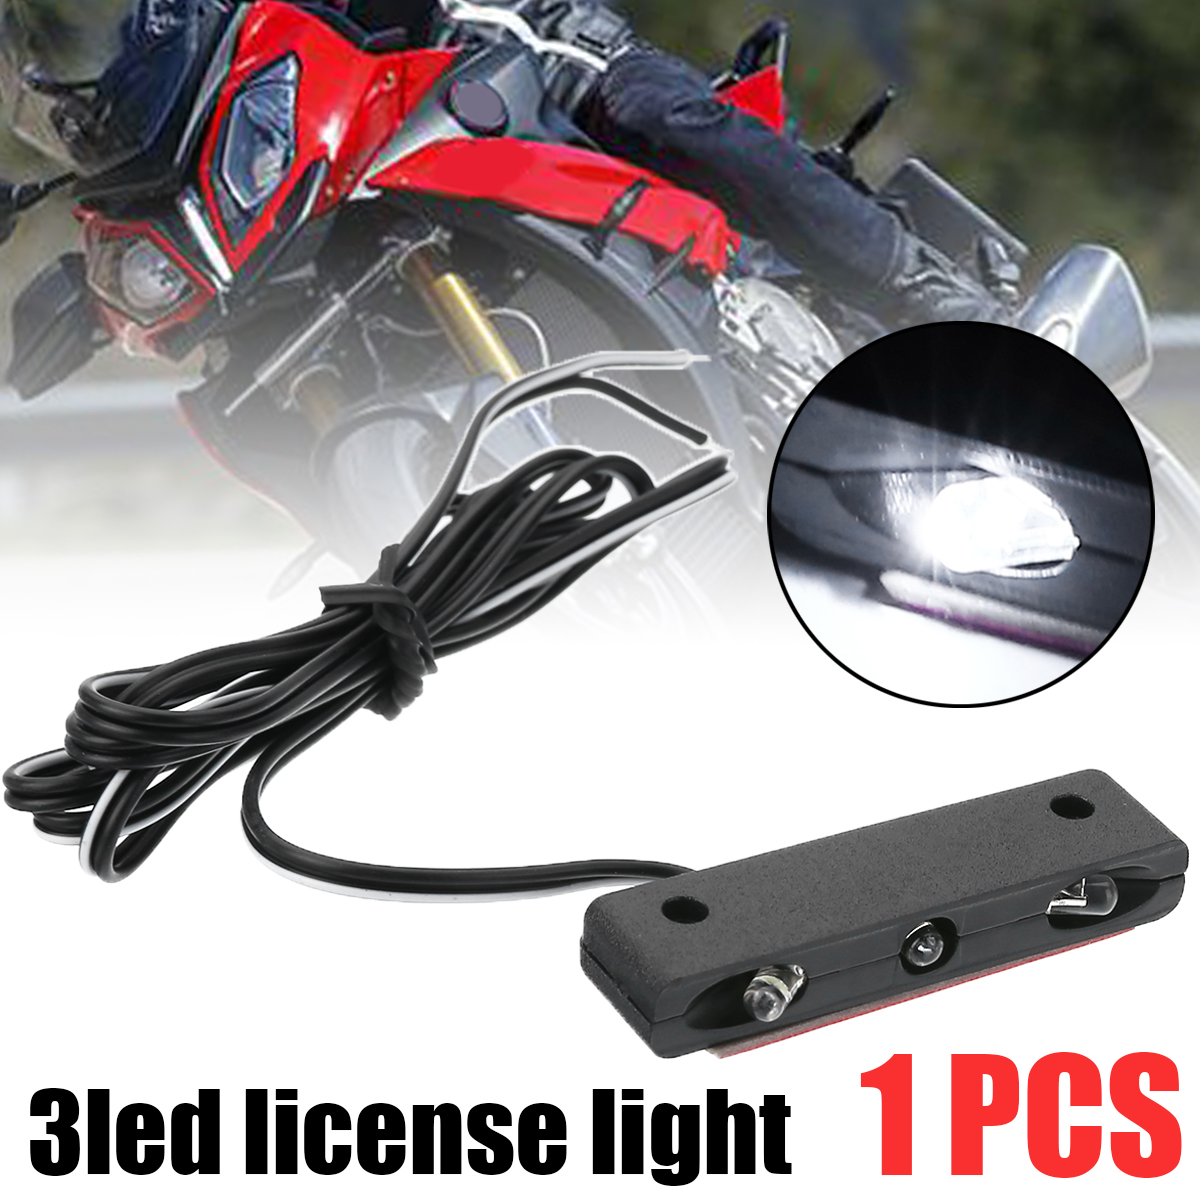 Mayitr 1pc Universal Motorcycle 3 LED License Plate White Light DC12V Motorbike Car Number Plate Lamp